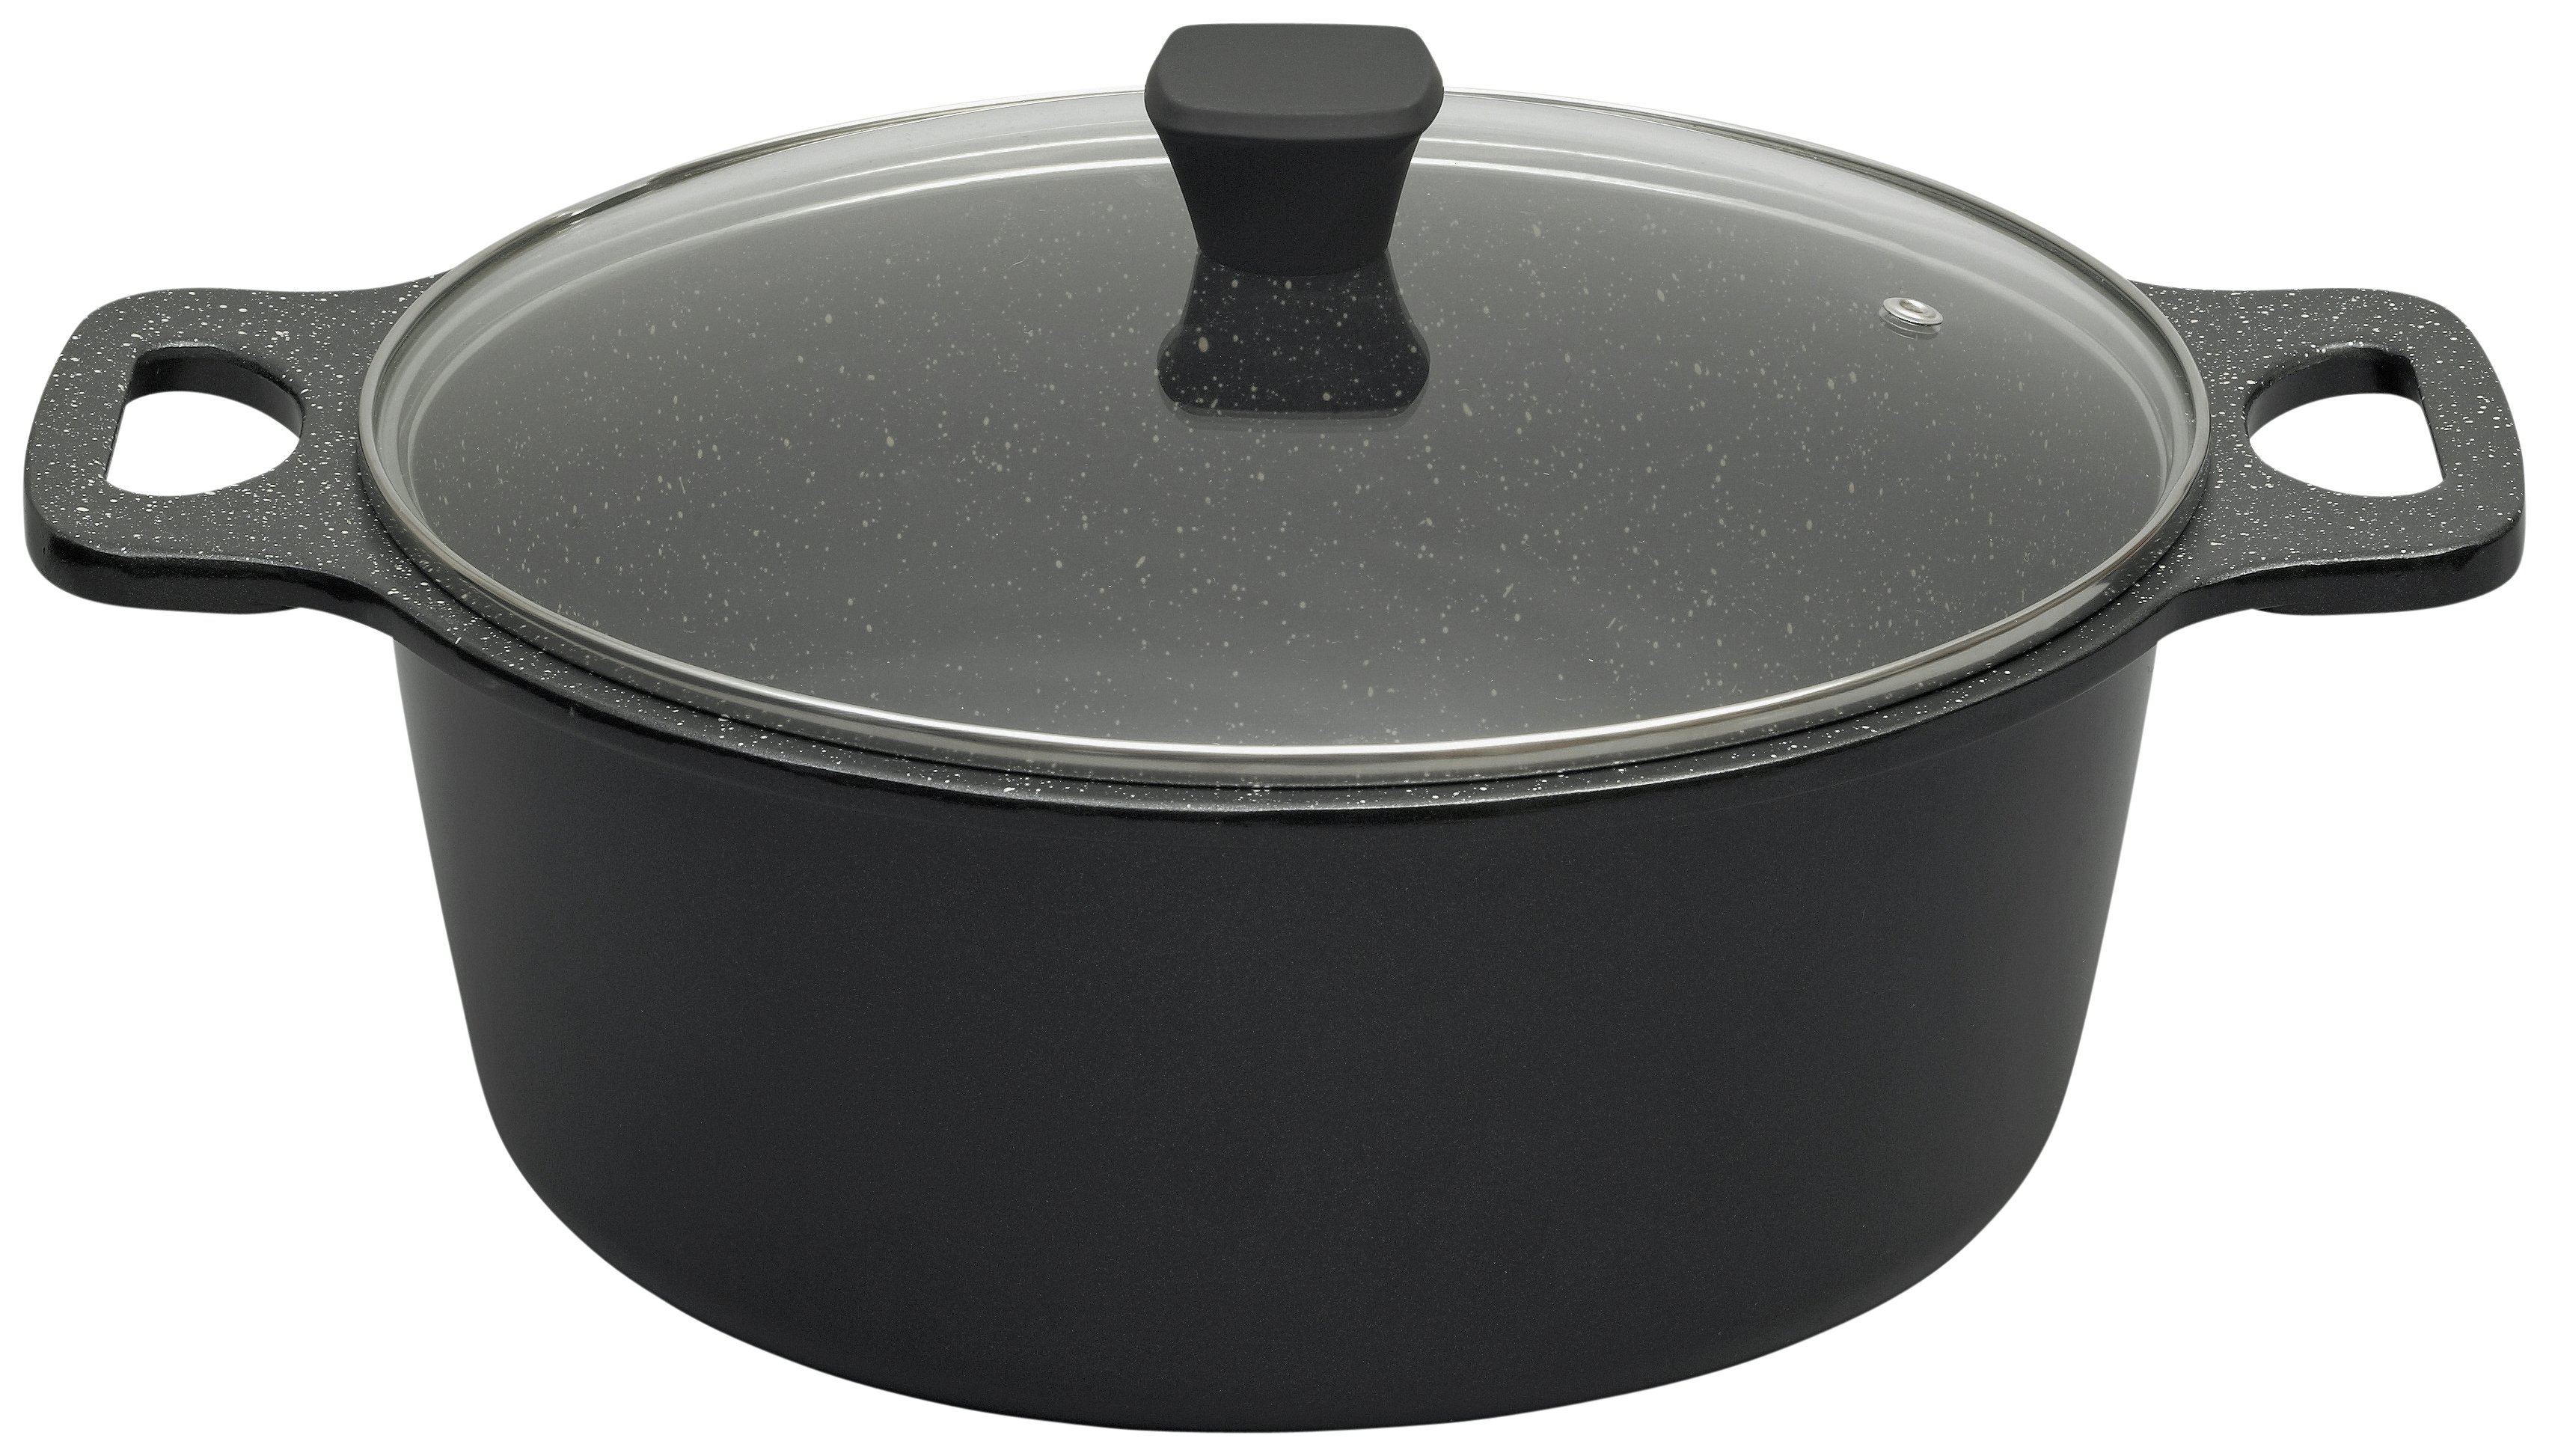 Image of Prestige - Stone Quartz 28cm Casserole Dish and Lid